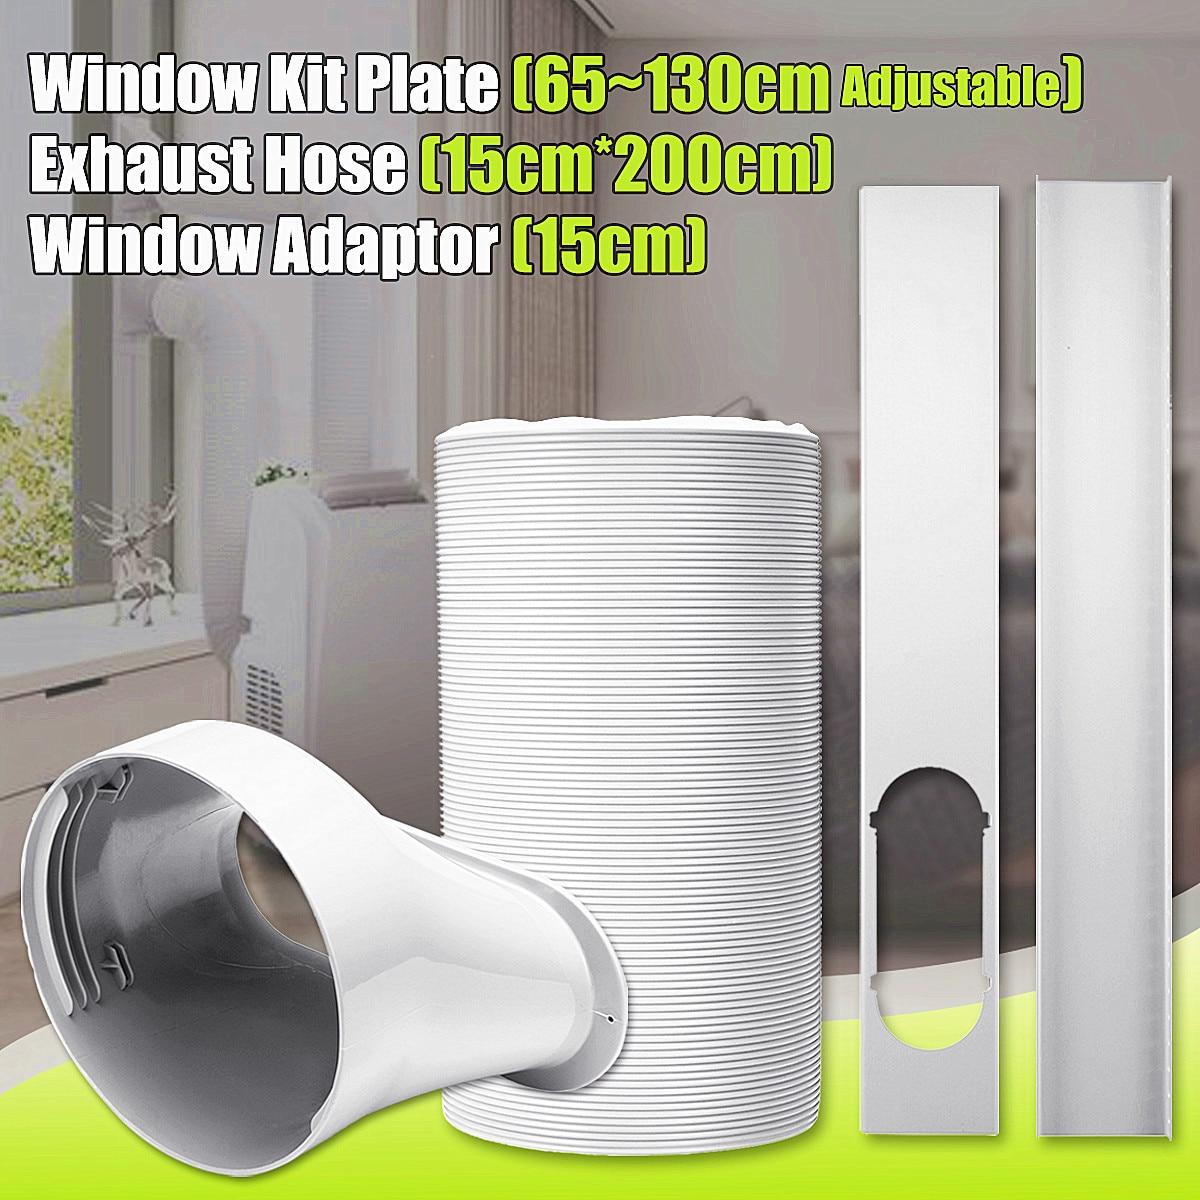 79 Exhaust Hose 6 Diameter For Air Conditioner+Window Adaptor+Window Kit Plate79 Exhaust Hose 6 Diameter For Air Conditioner+Window Adaptor+Window Kit Plate